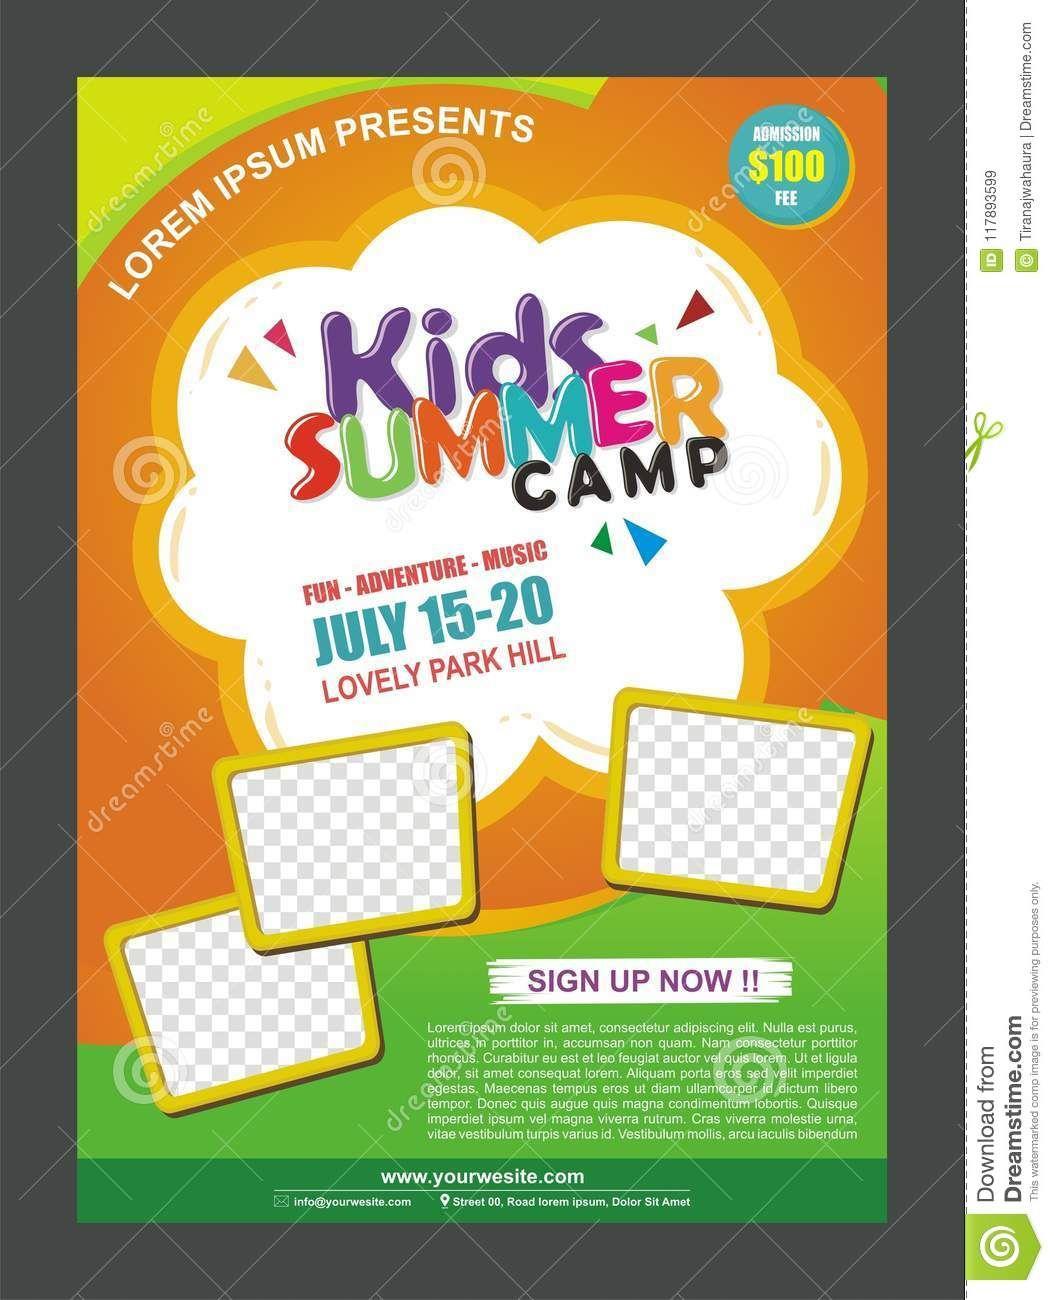 Kids Summer Camp Banner Poster Design Template For Kids For Summer Camp Brochure Free Brochure Template Brochure Templates Free Download Summer Camps For Kids Free summer camp flyer template